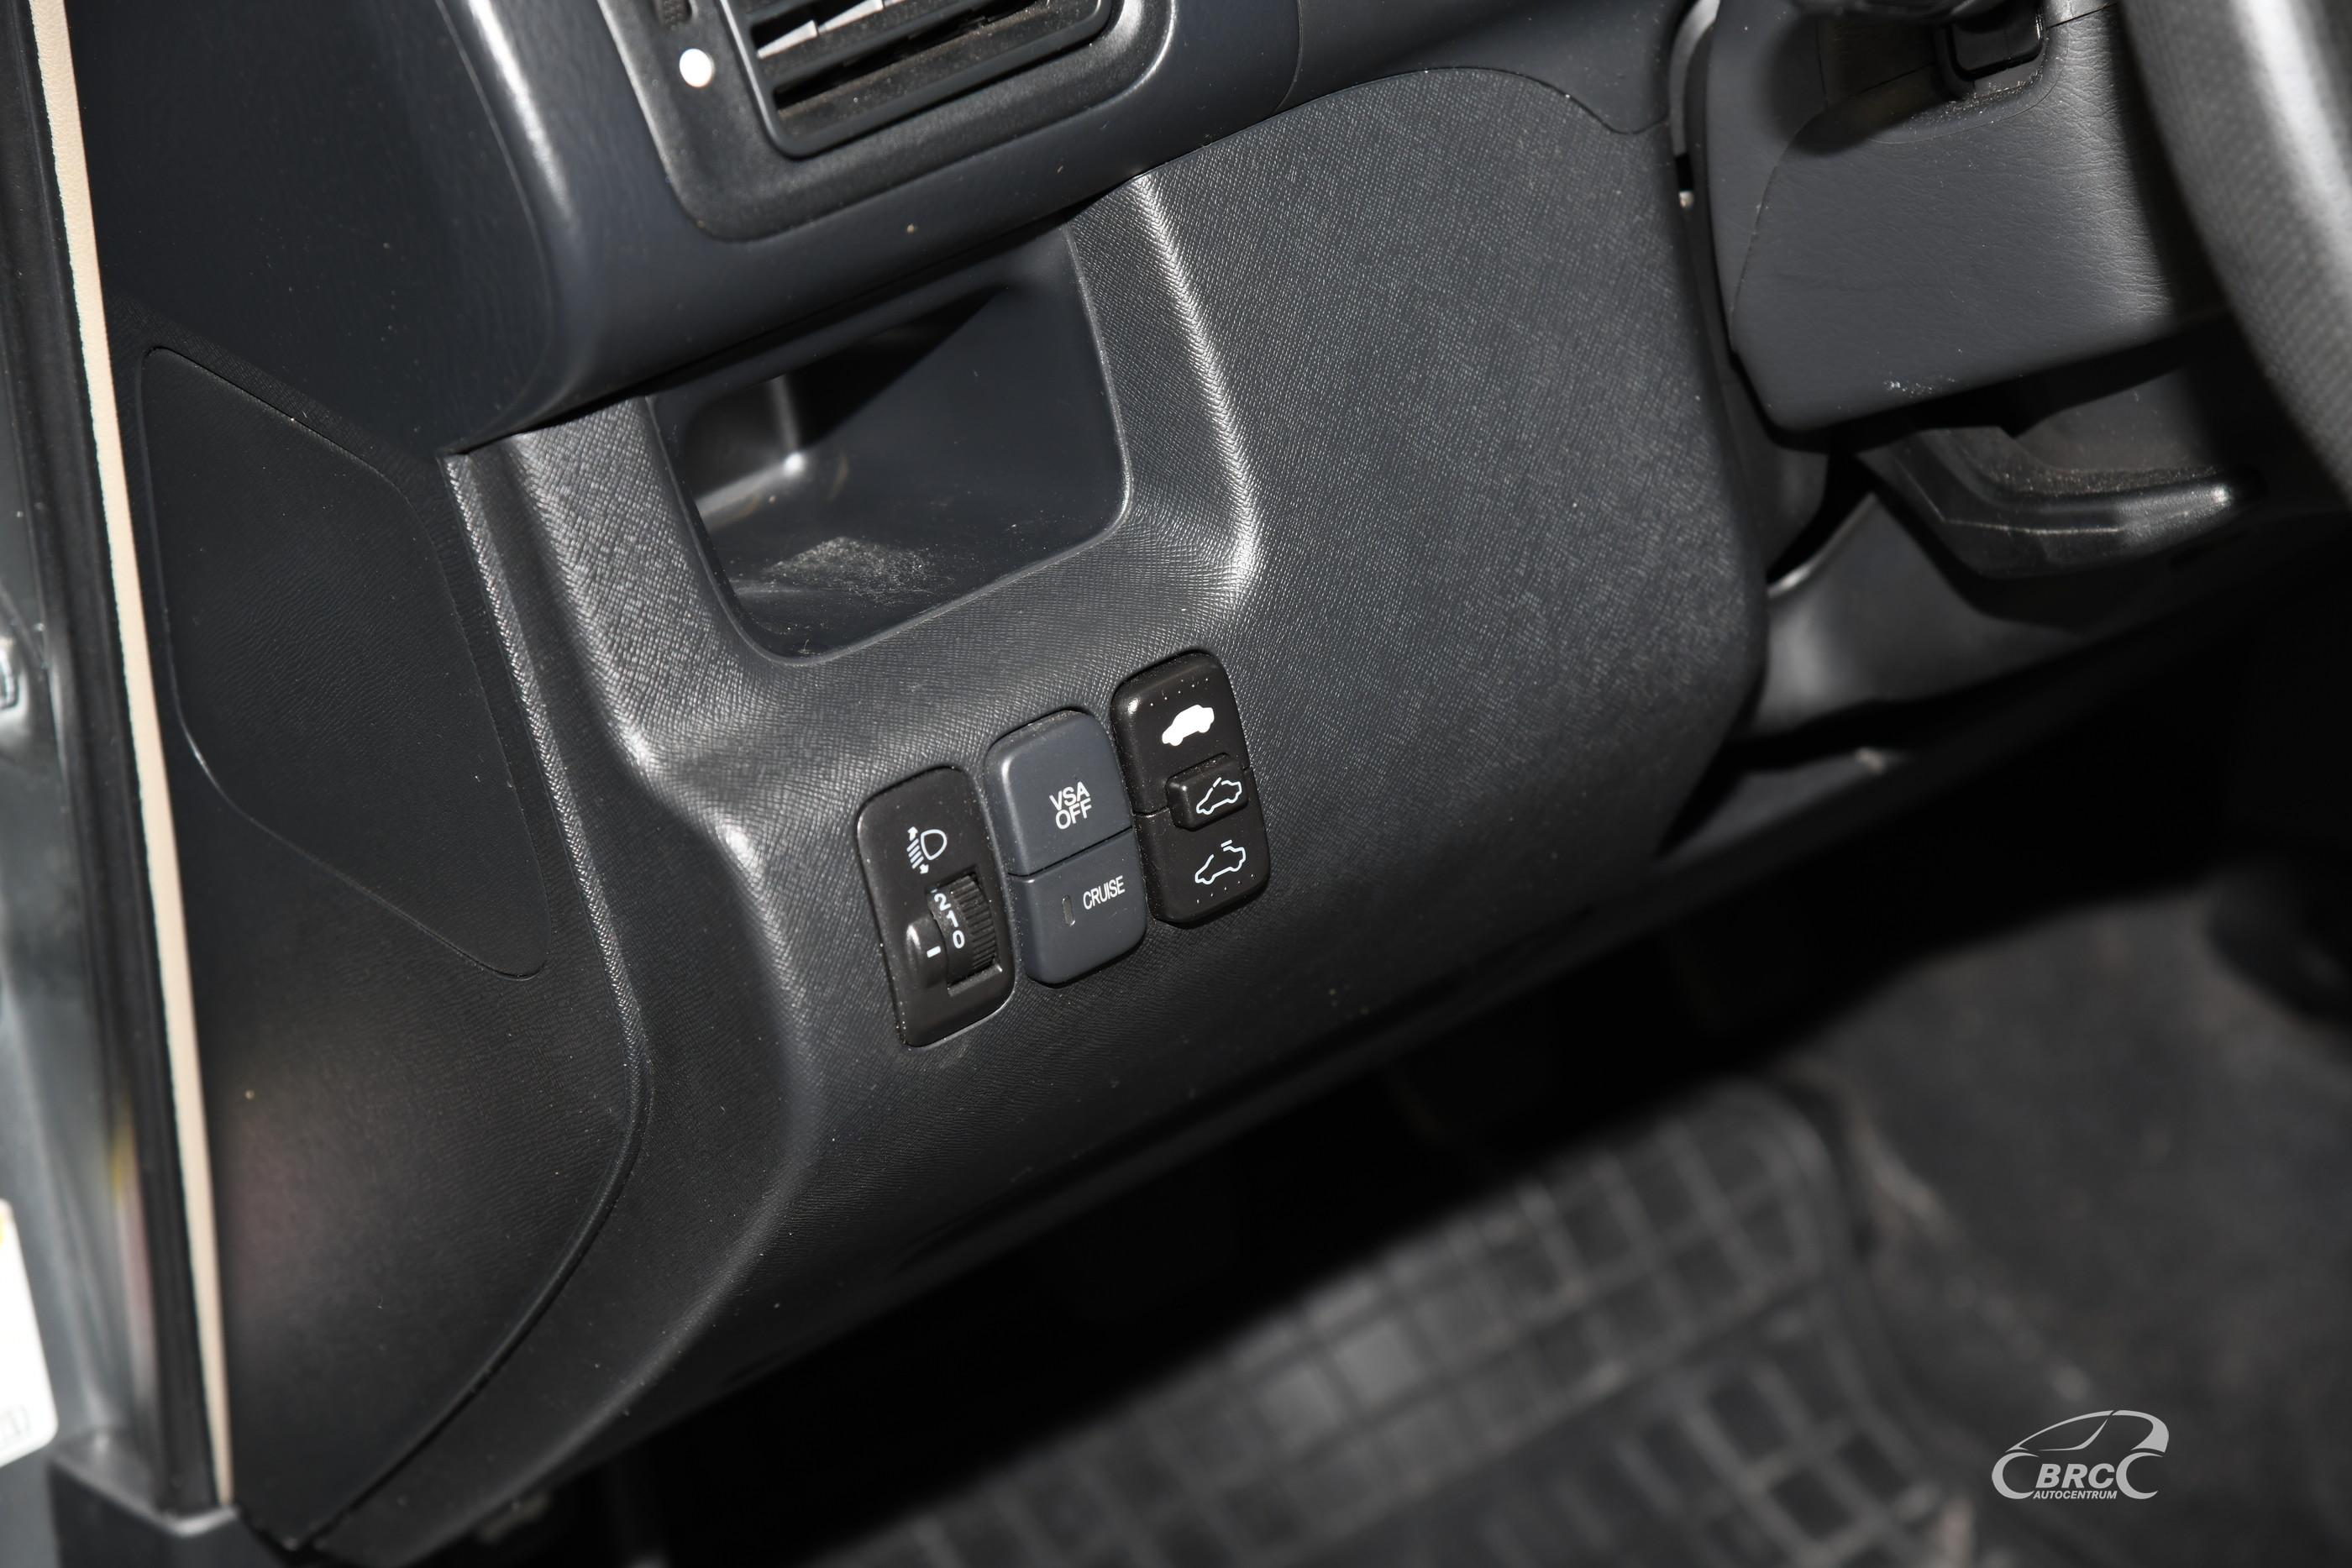 Honda CR-V 2.2 i-CTDi